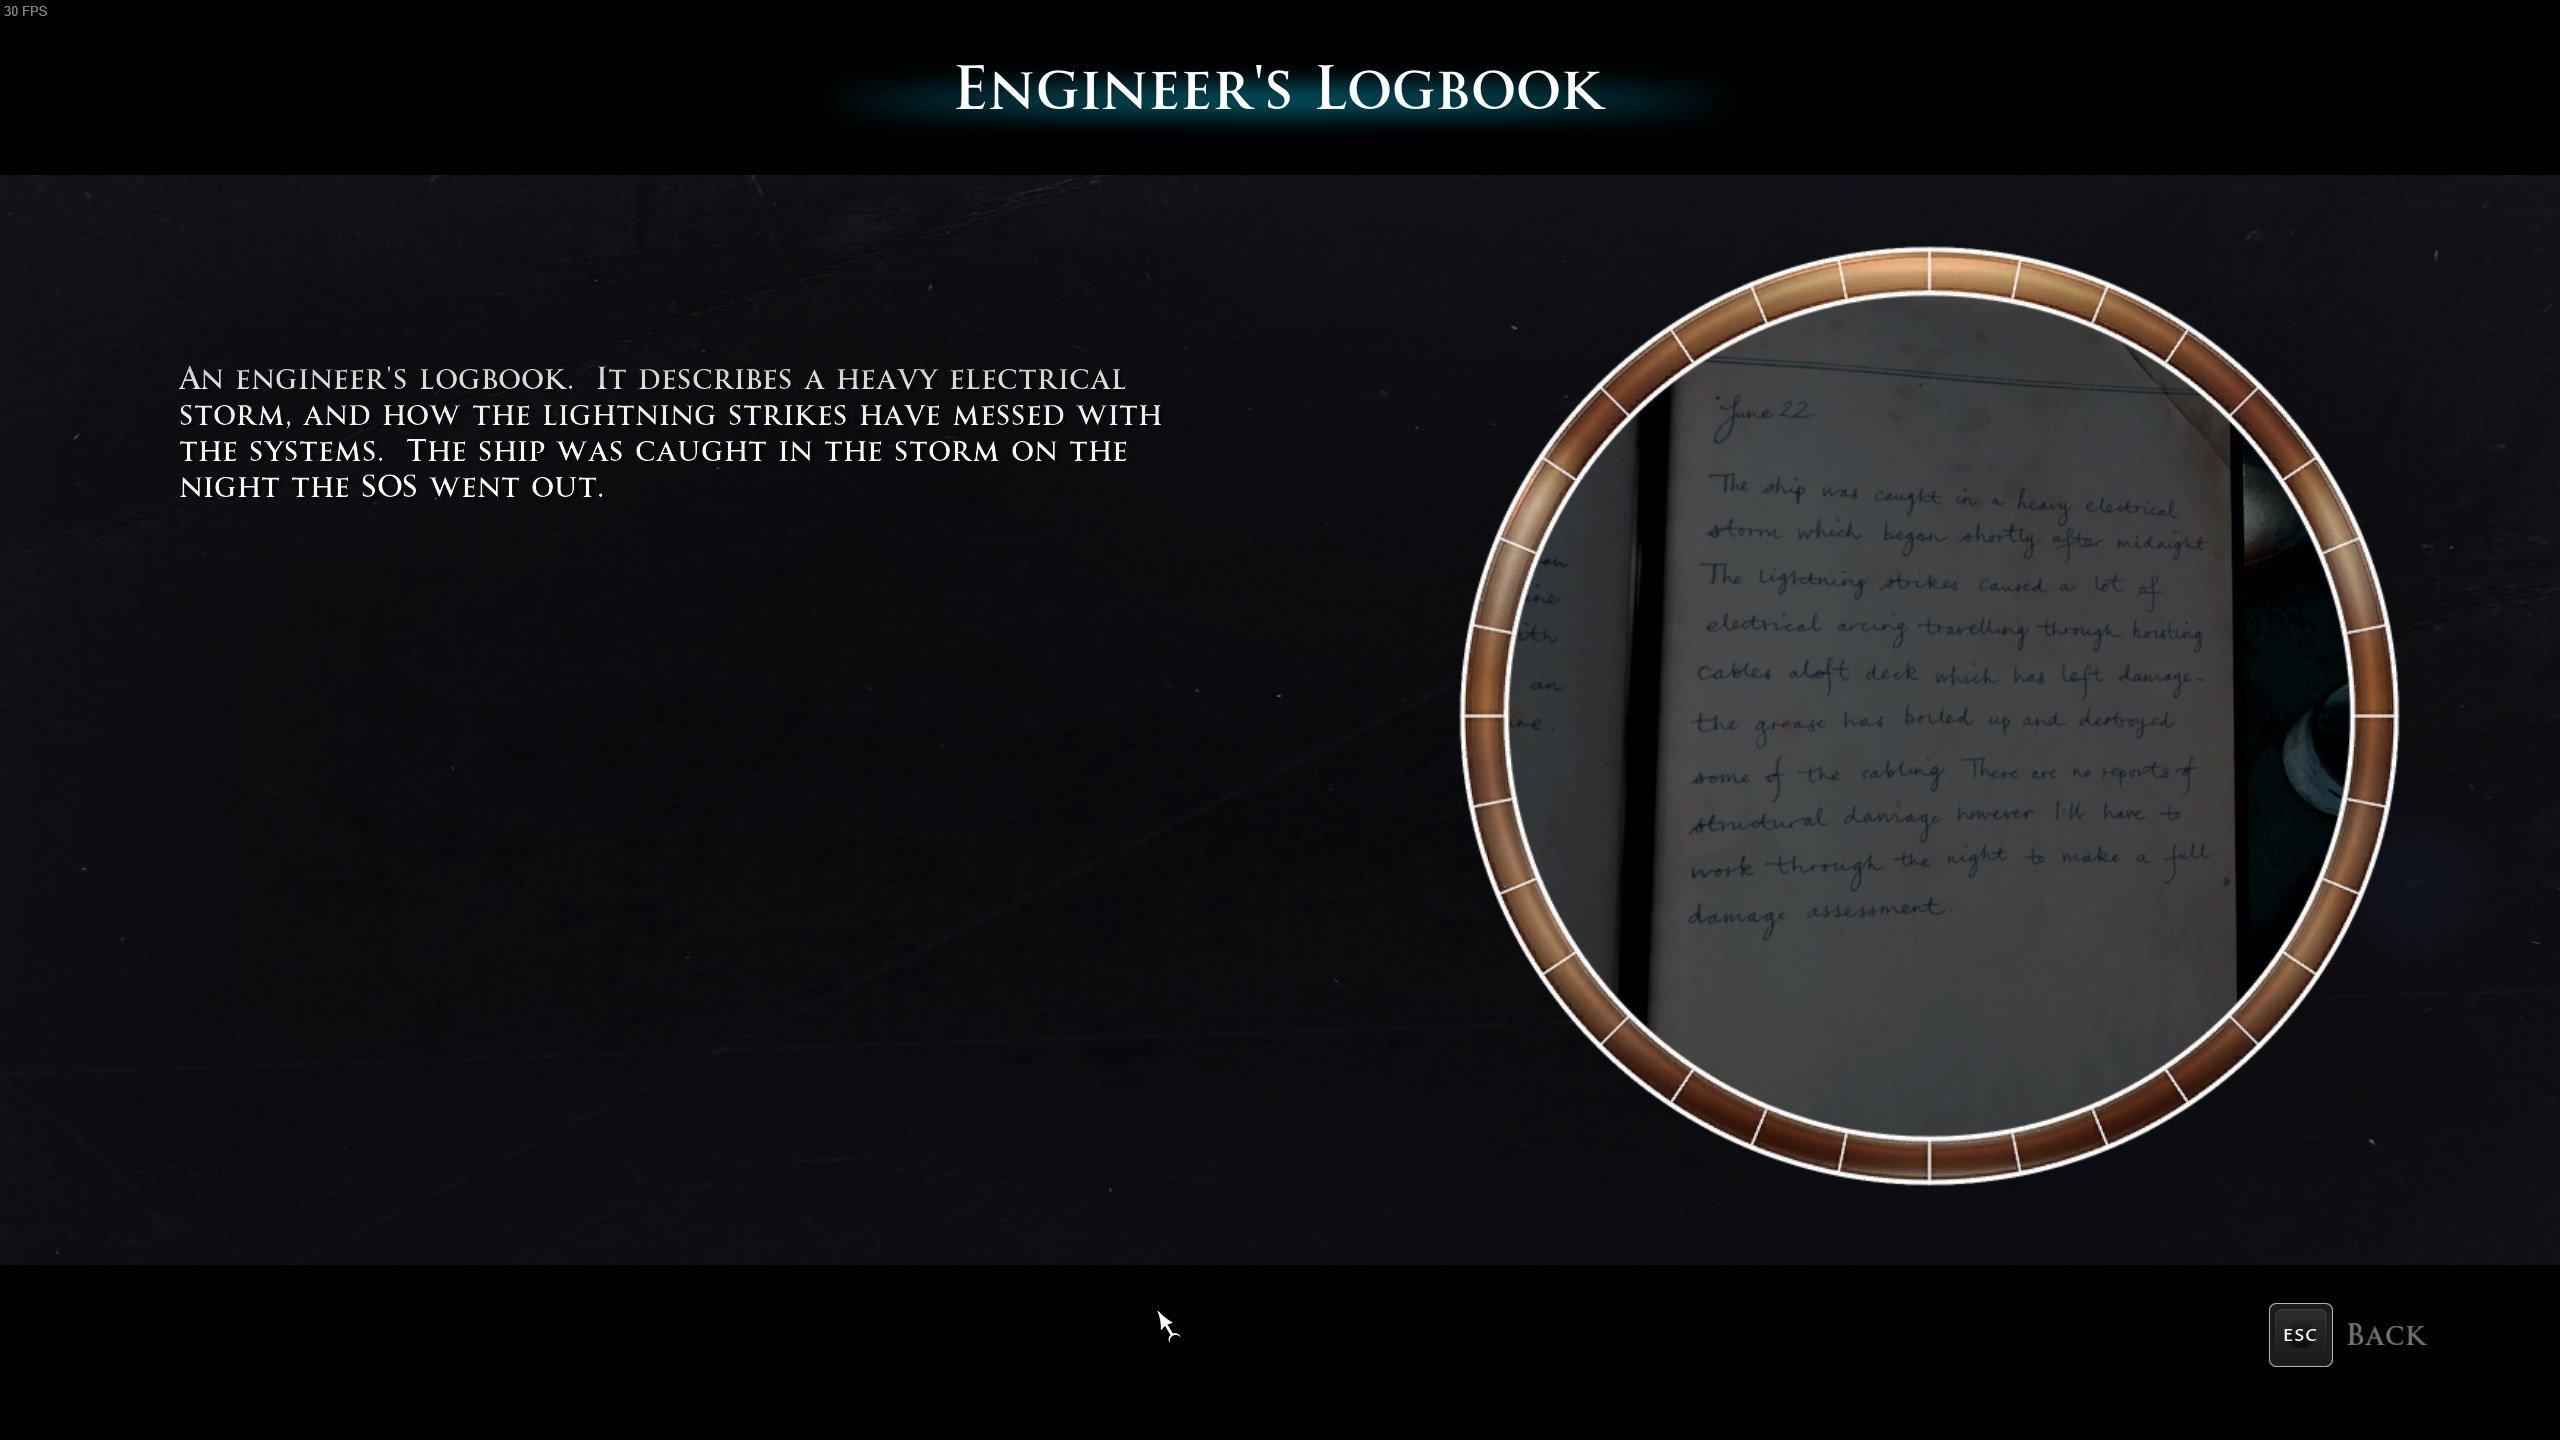 رجل ميدان - دفتر المهندس